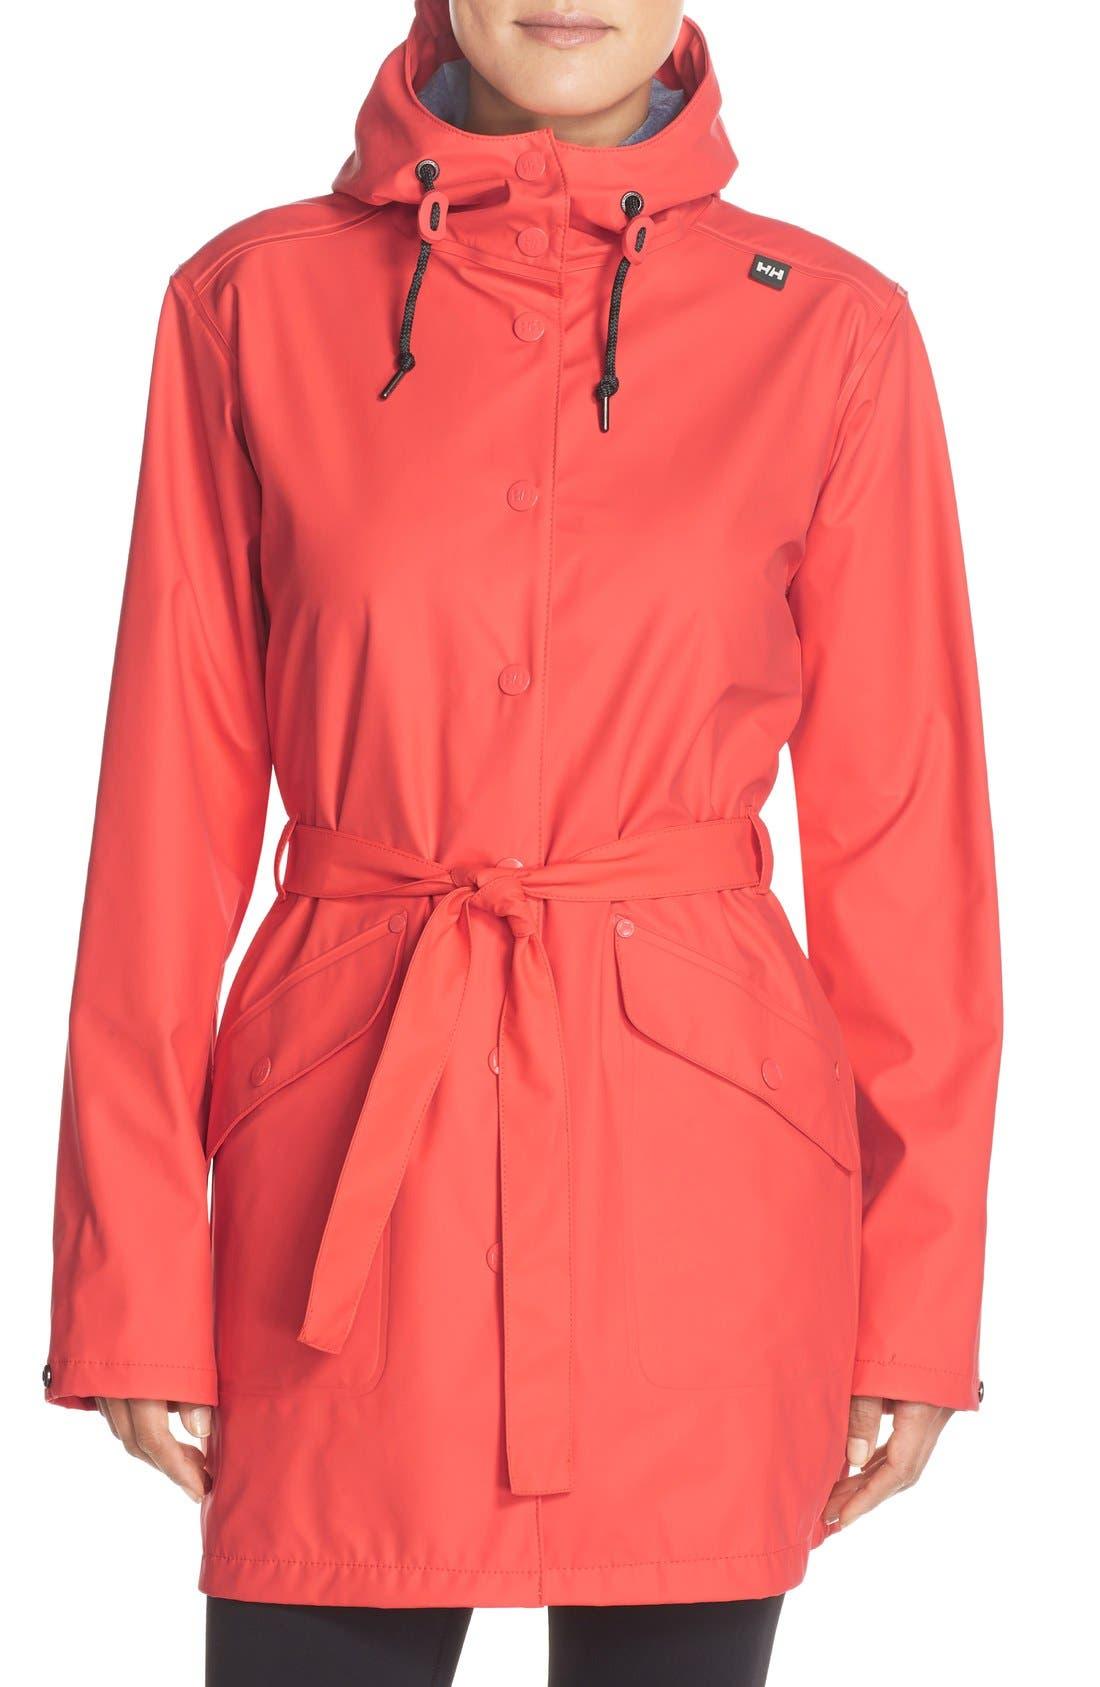 Alternate Image 1 Selected - Helly Hansen 'Kirkwall' Raincoat